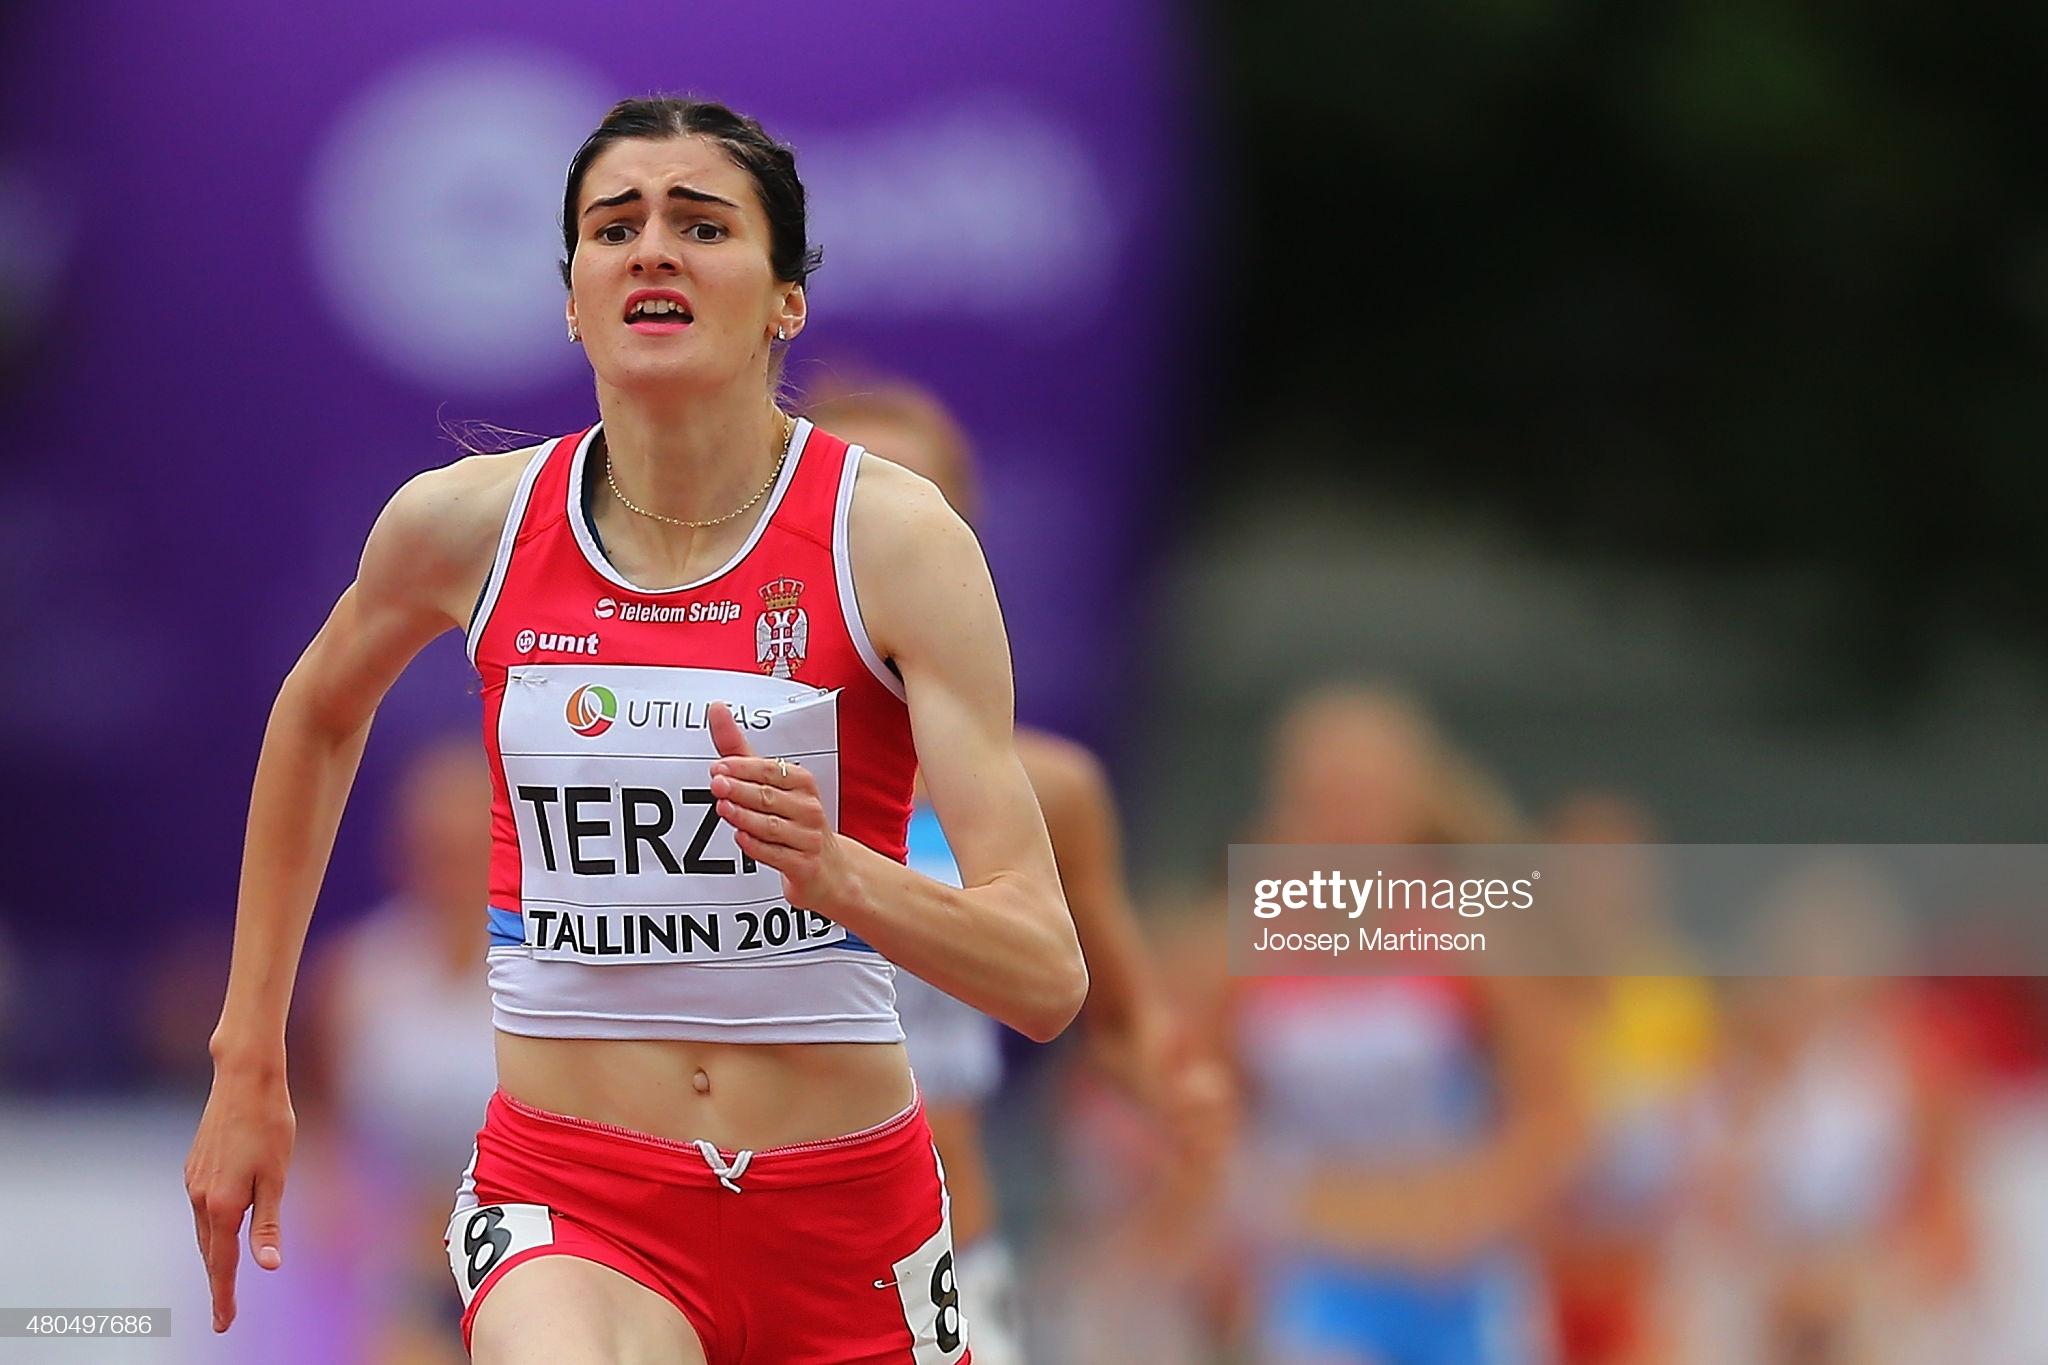 Amela Terzić, U23 EP 2015, Talin